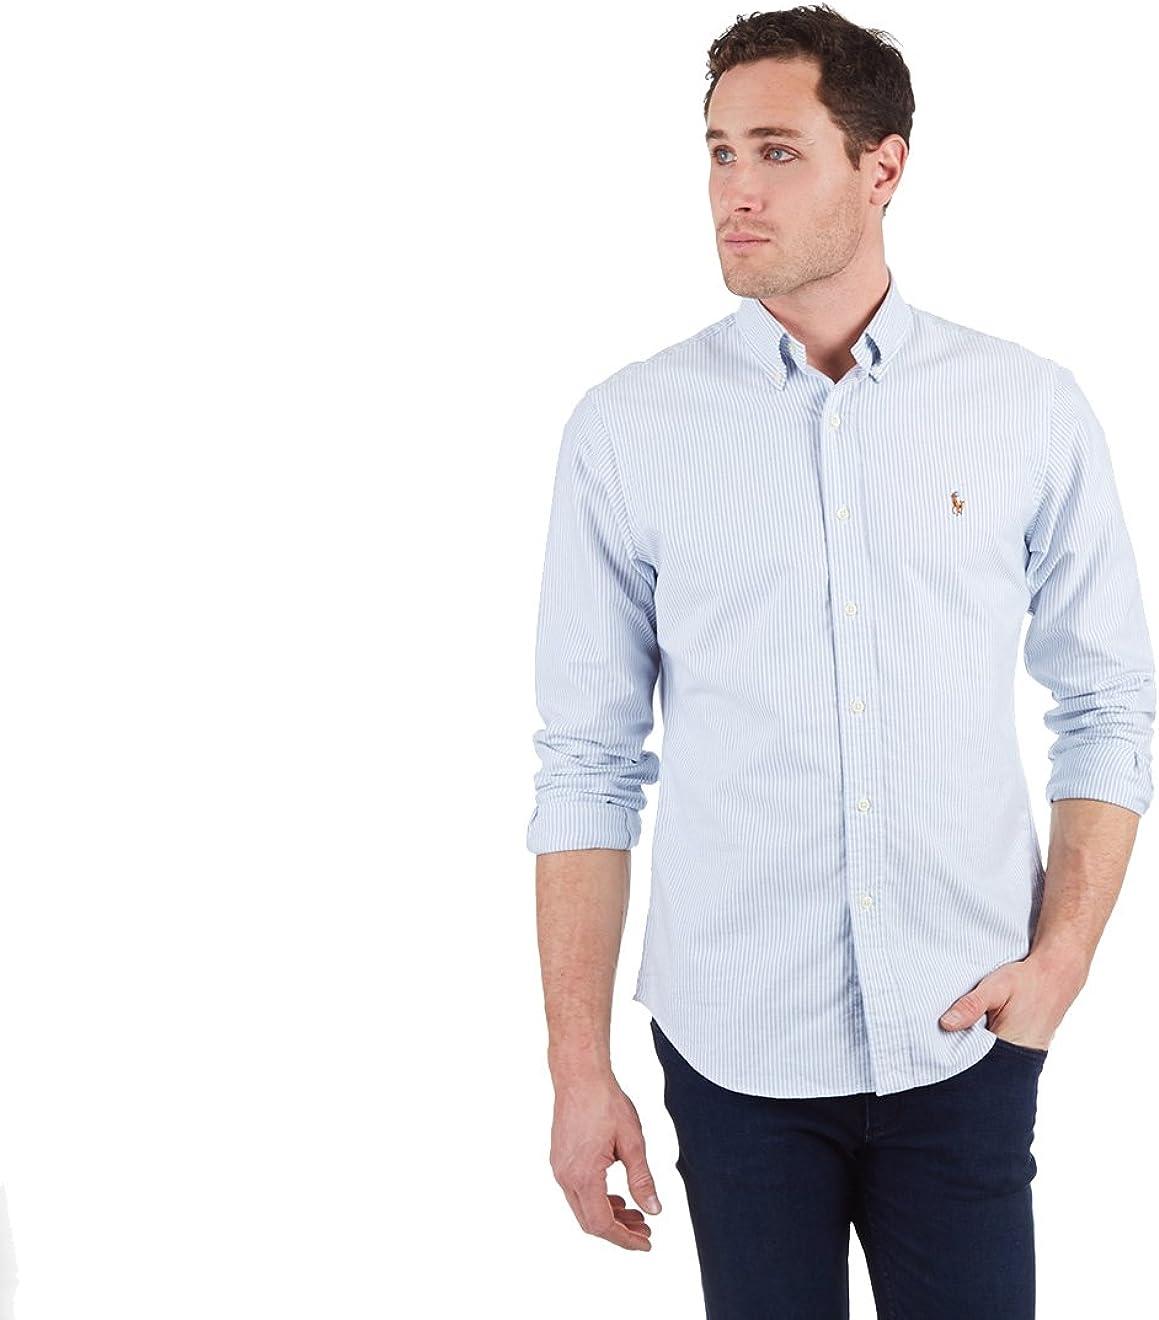 Polo Ralph Lauren Men's Standard Fit Oxford Shirt, WHITE/BLUE (XL)